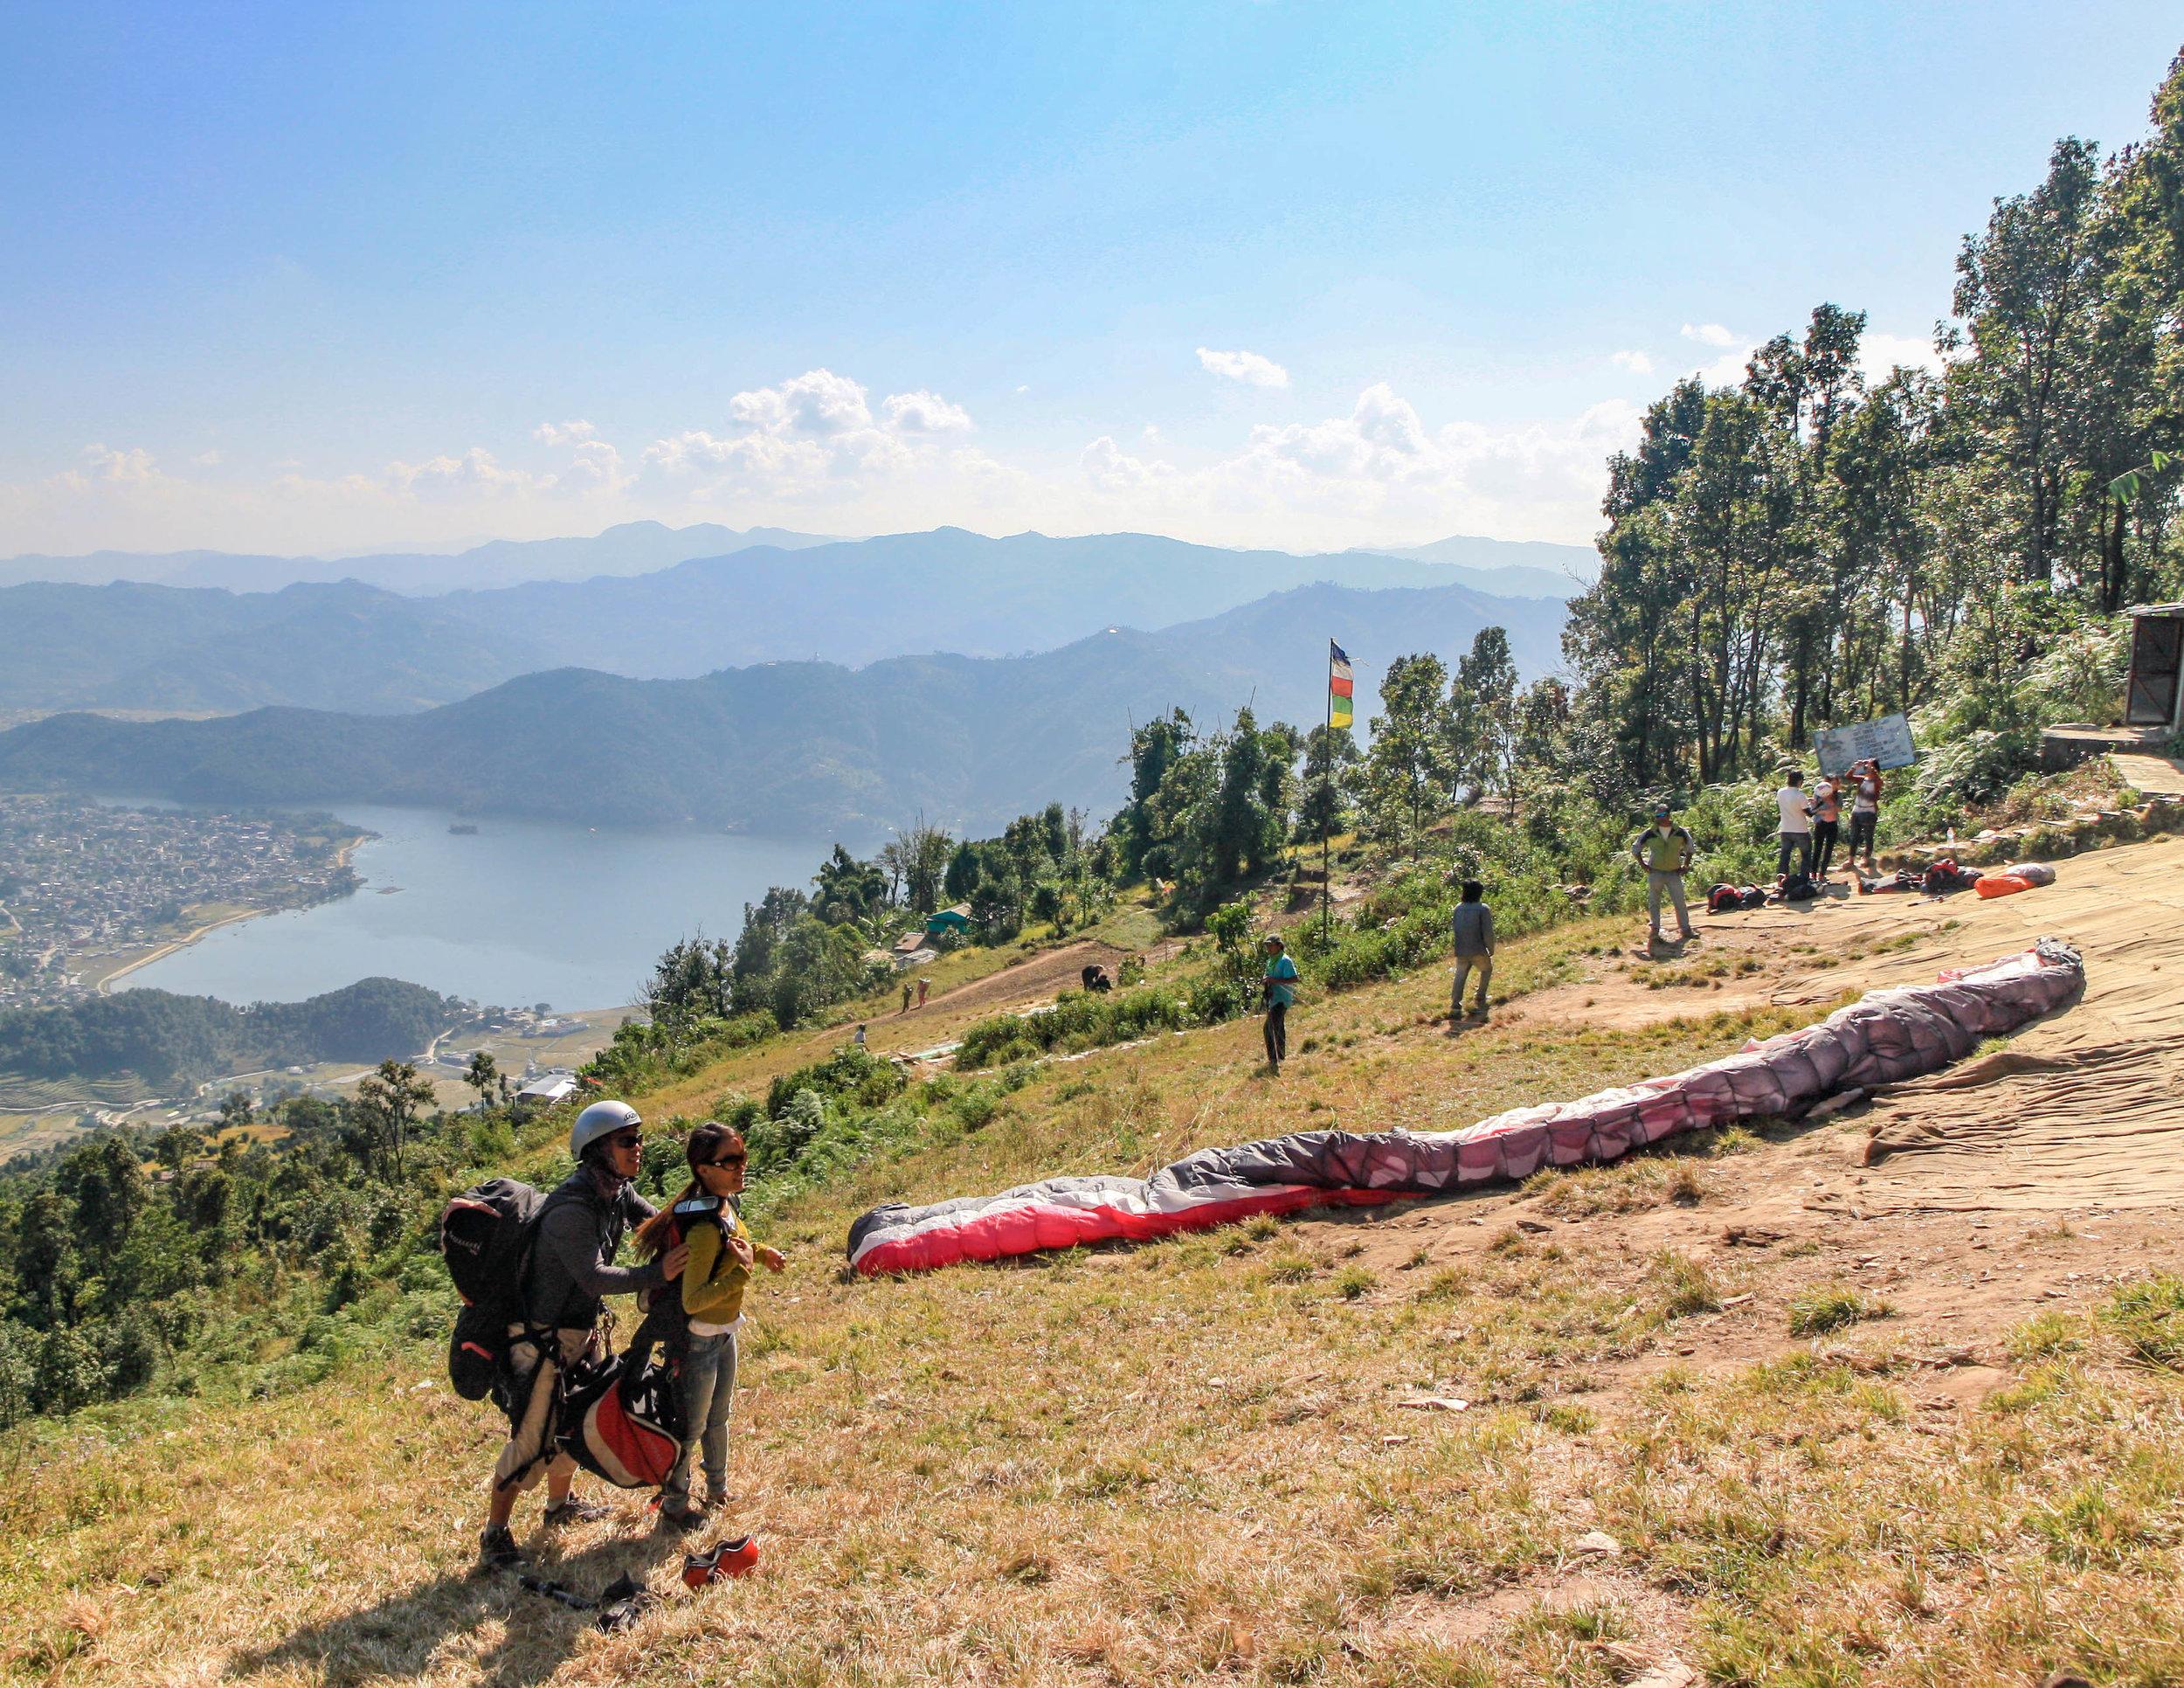 Paragliding in Pokhara, Nepal